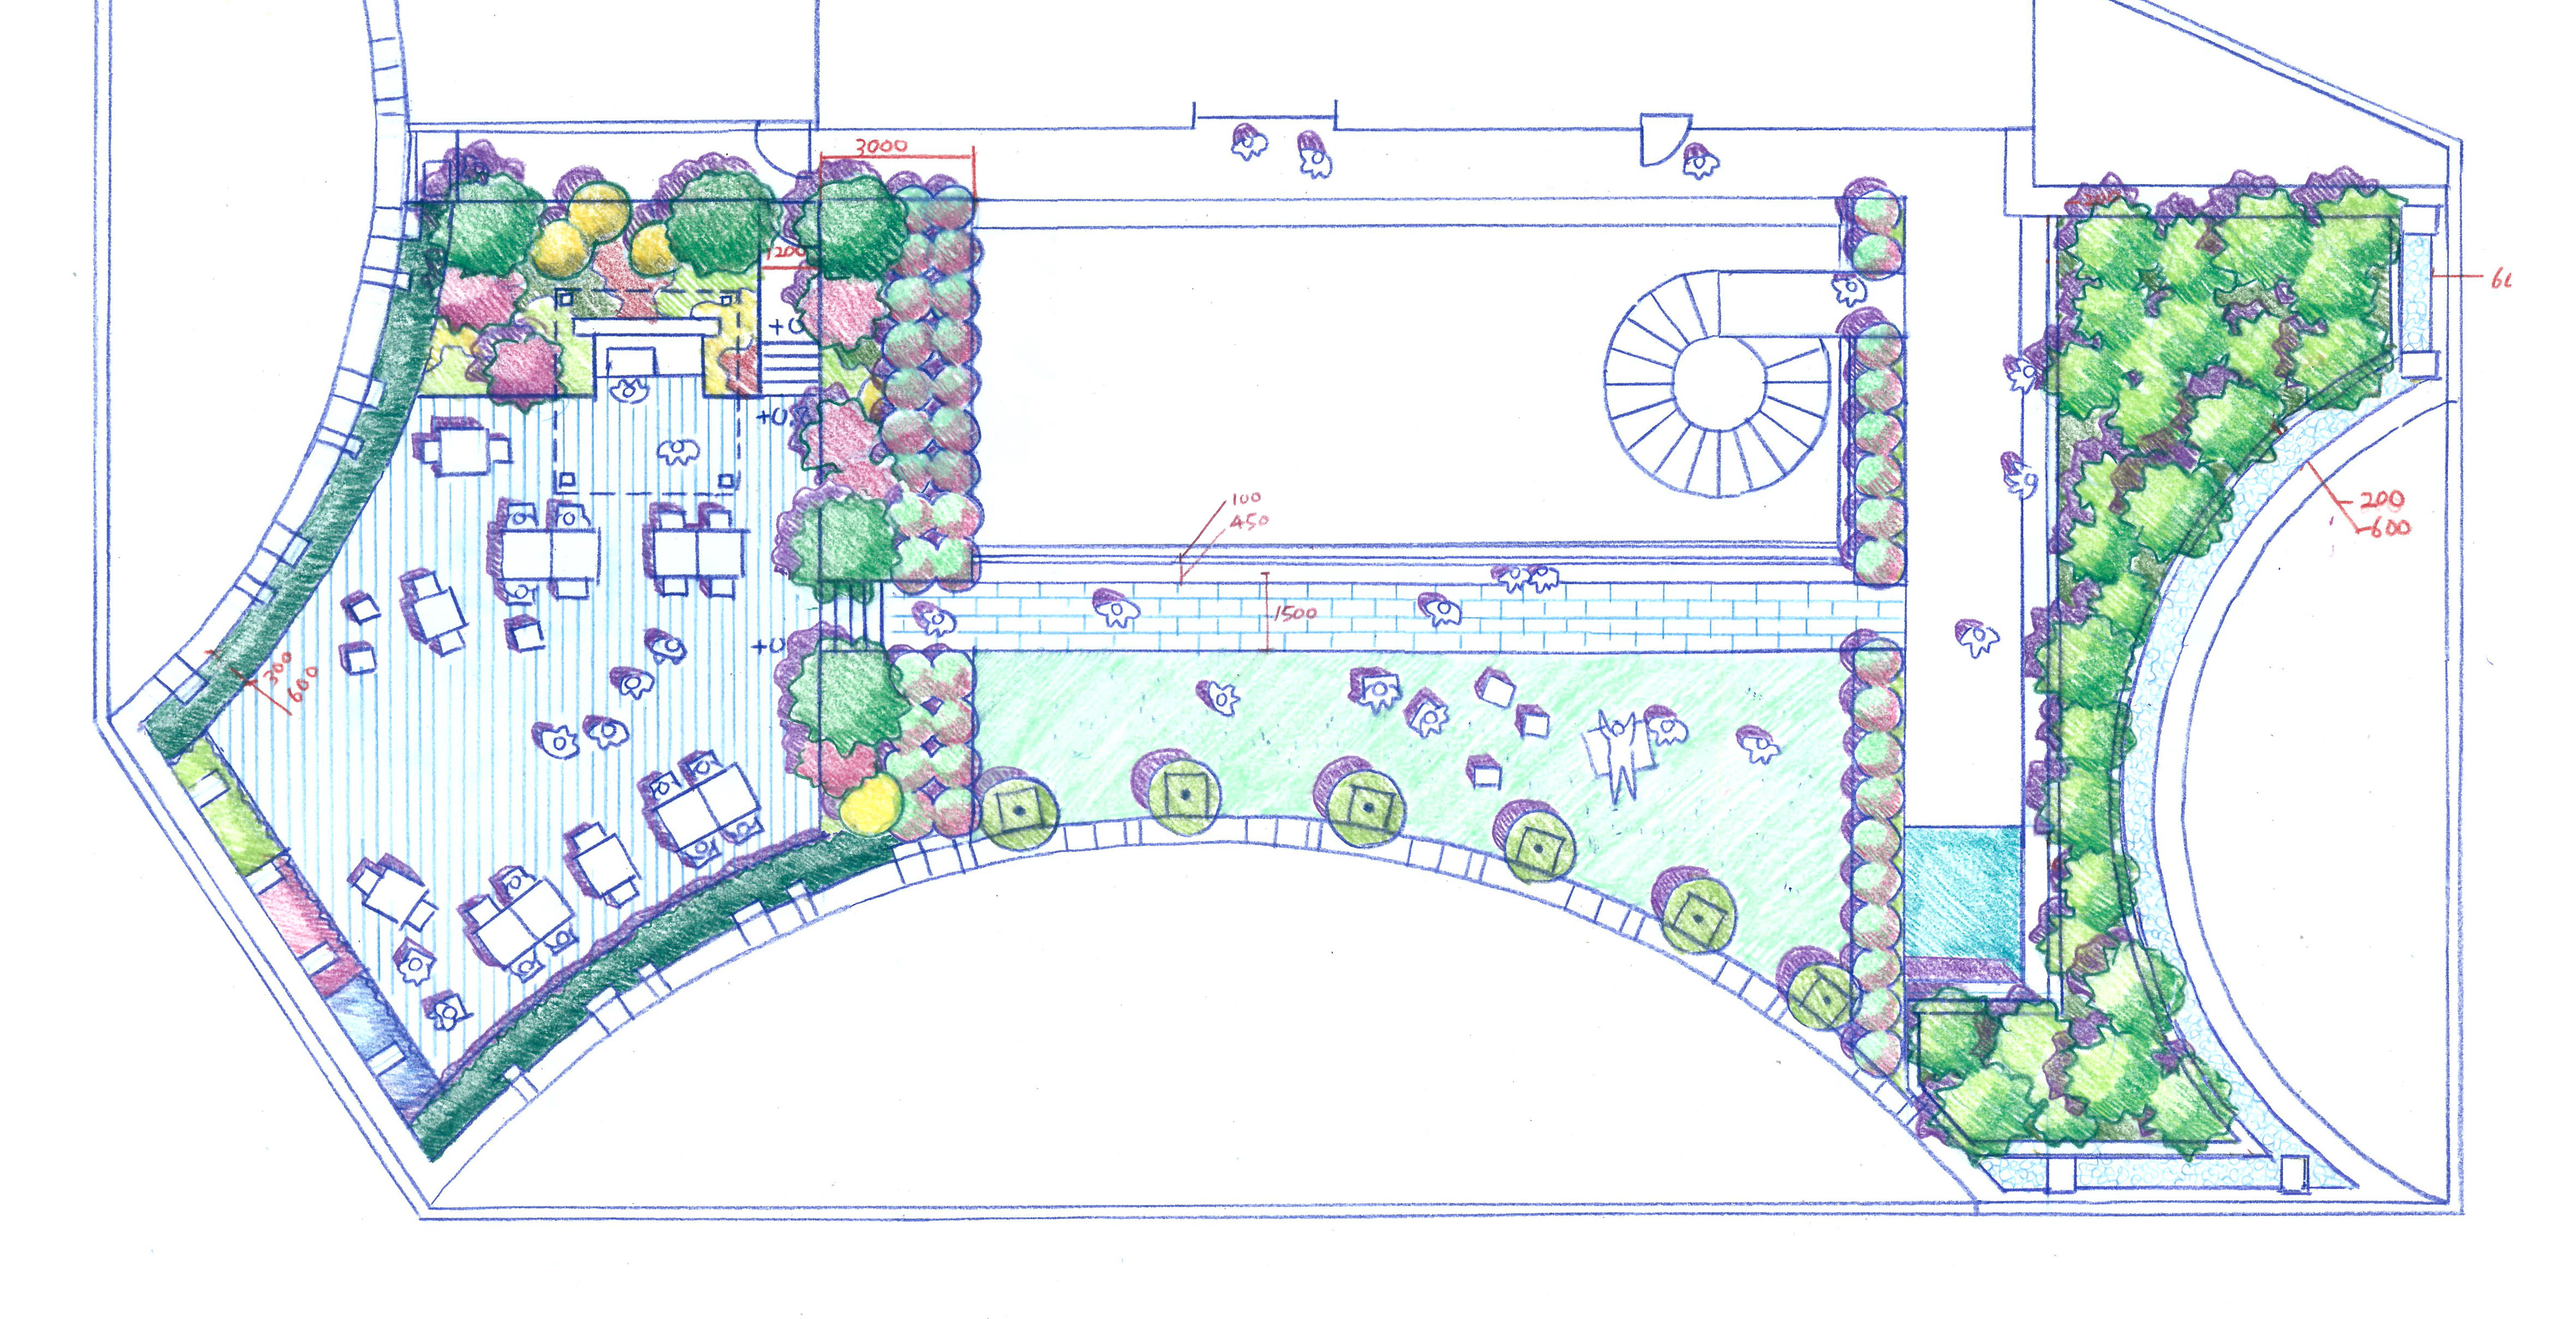 Roof garden design, Yeonyi Bld.